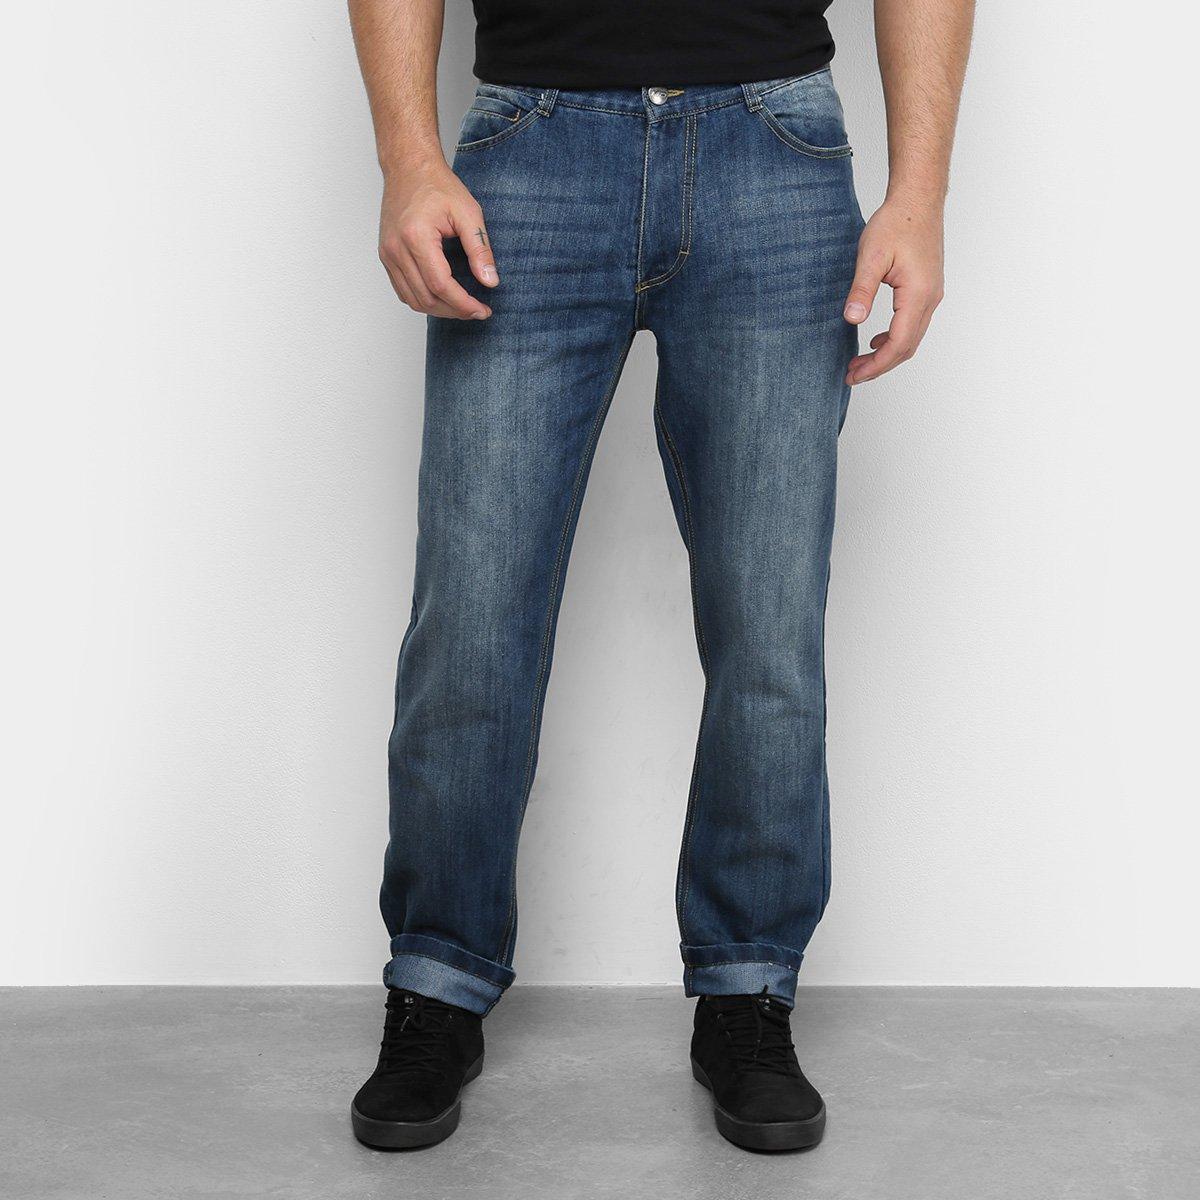 Calça Jeans HD Estonada Masculina